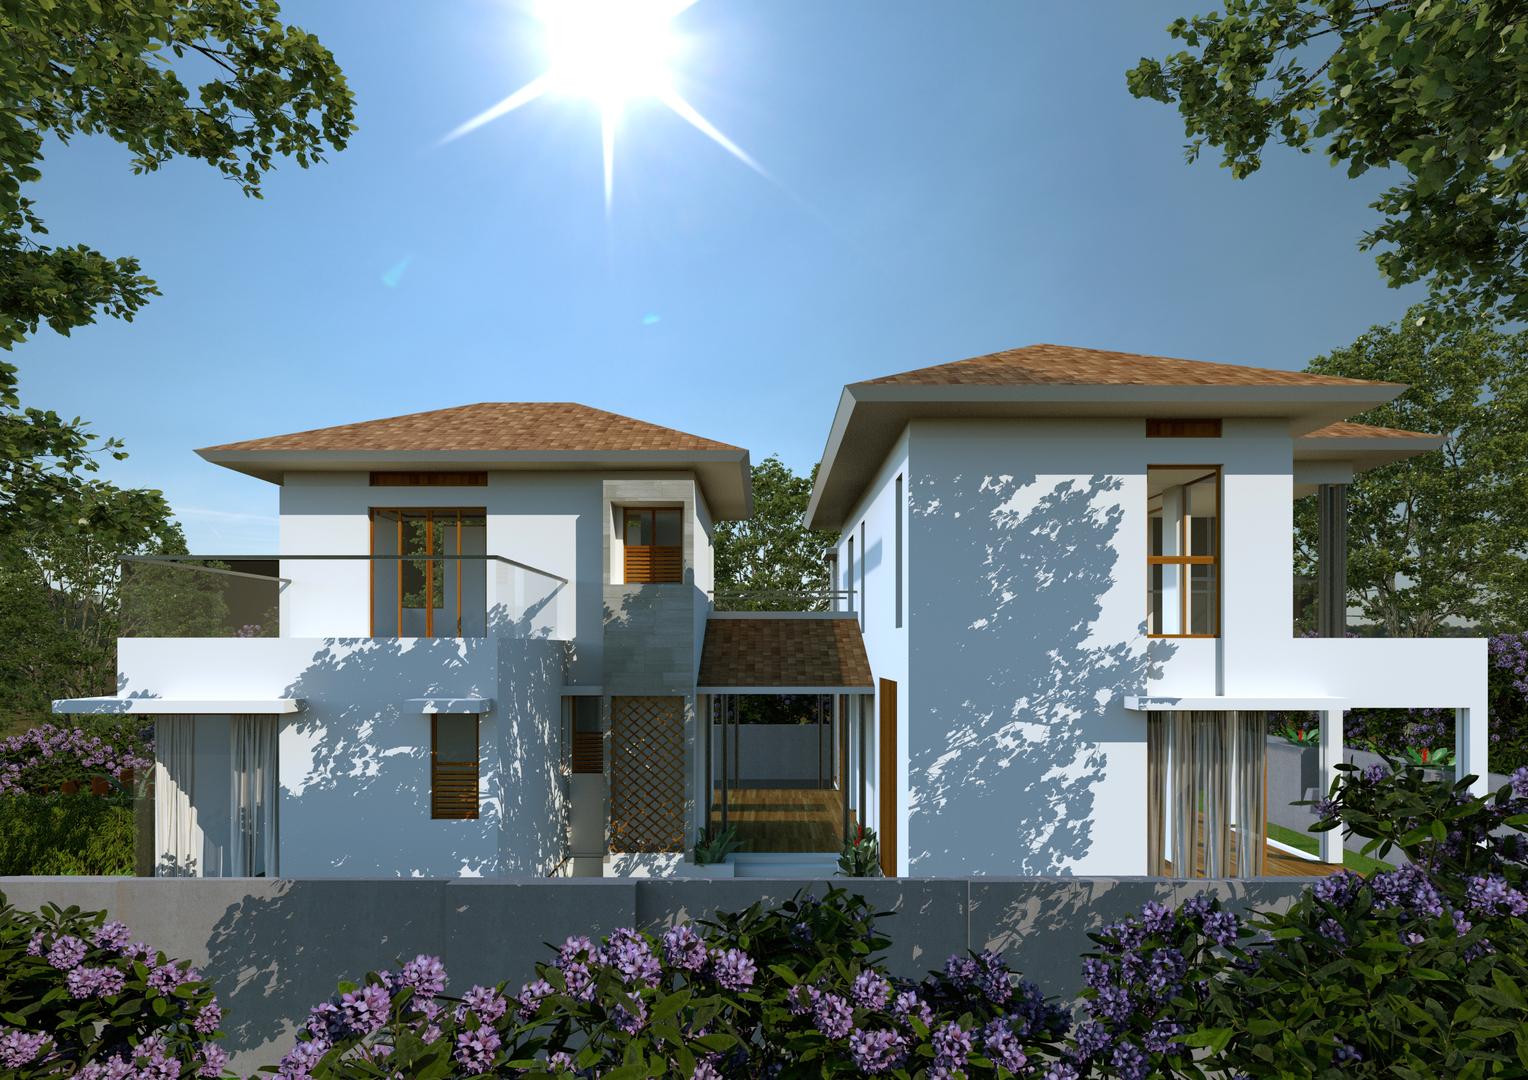 Zephyrgoa - Residential Properties, Rental Properties, Homes for Sale